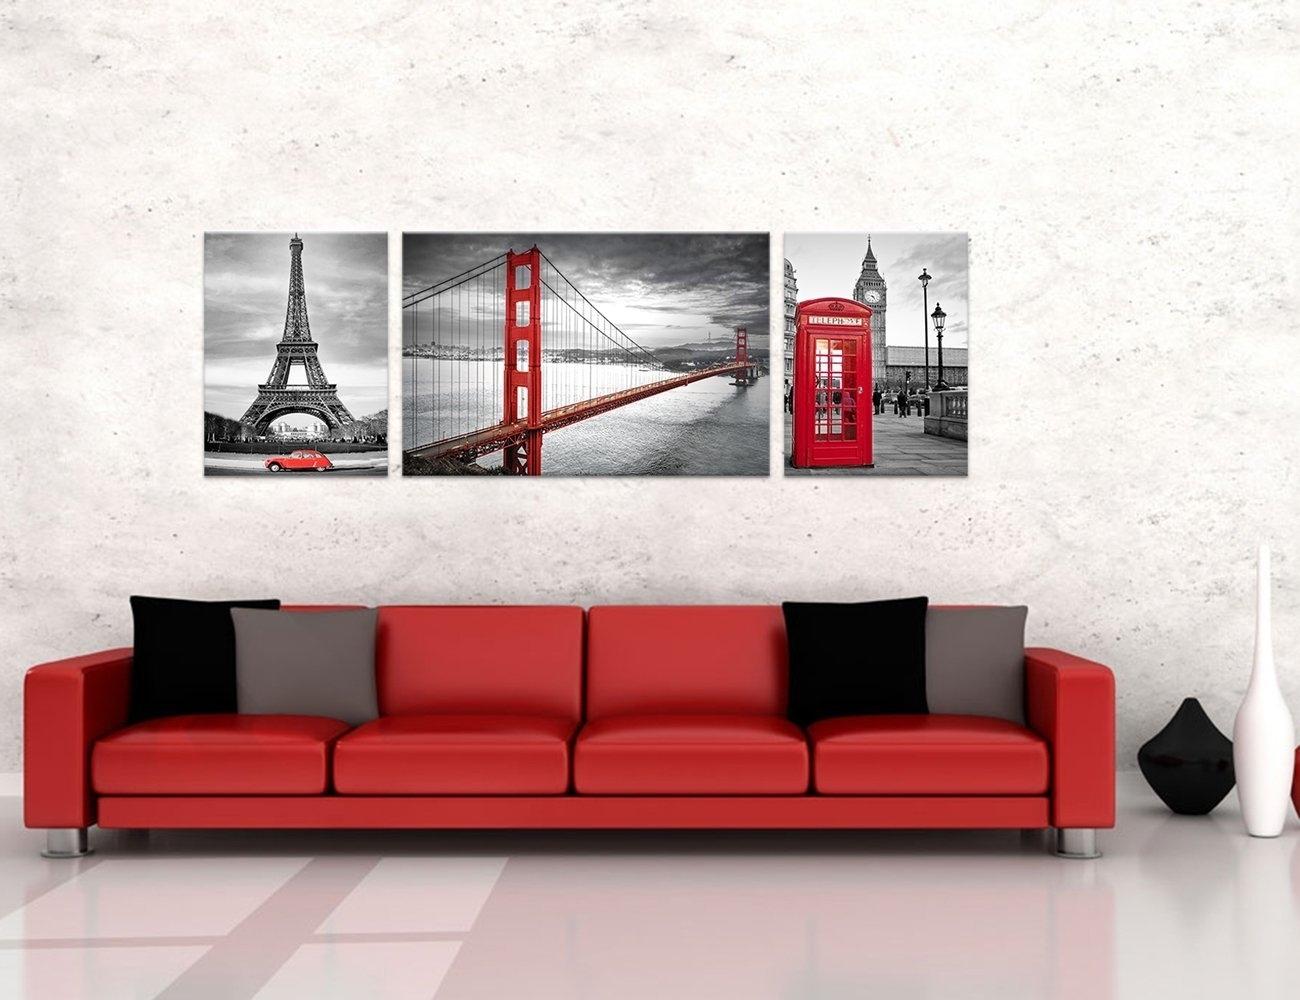 San Francisco Wall Art – Amthuchanoi Intended For Current San Francisco Wall Art (View 8 of 20)